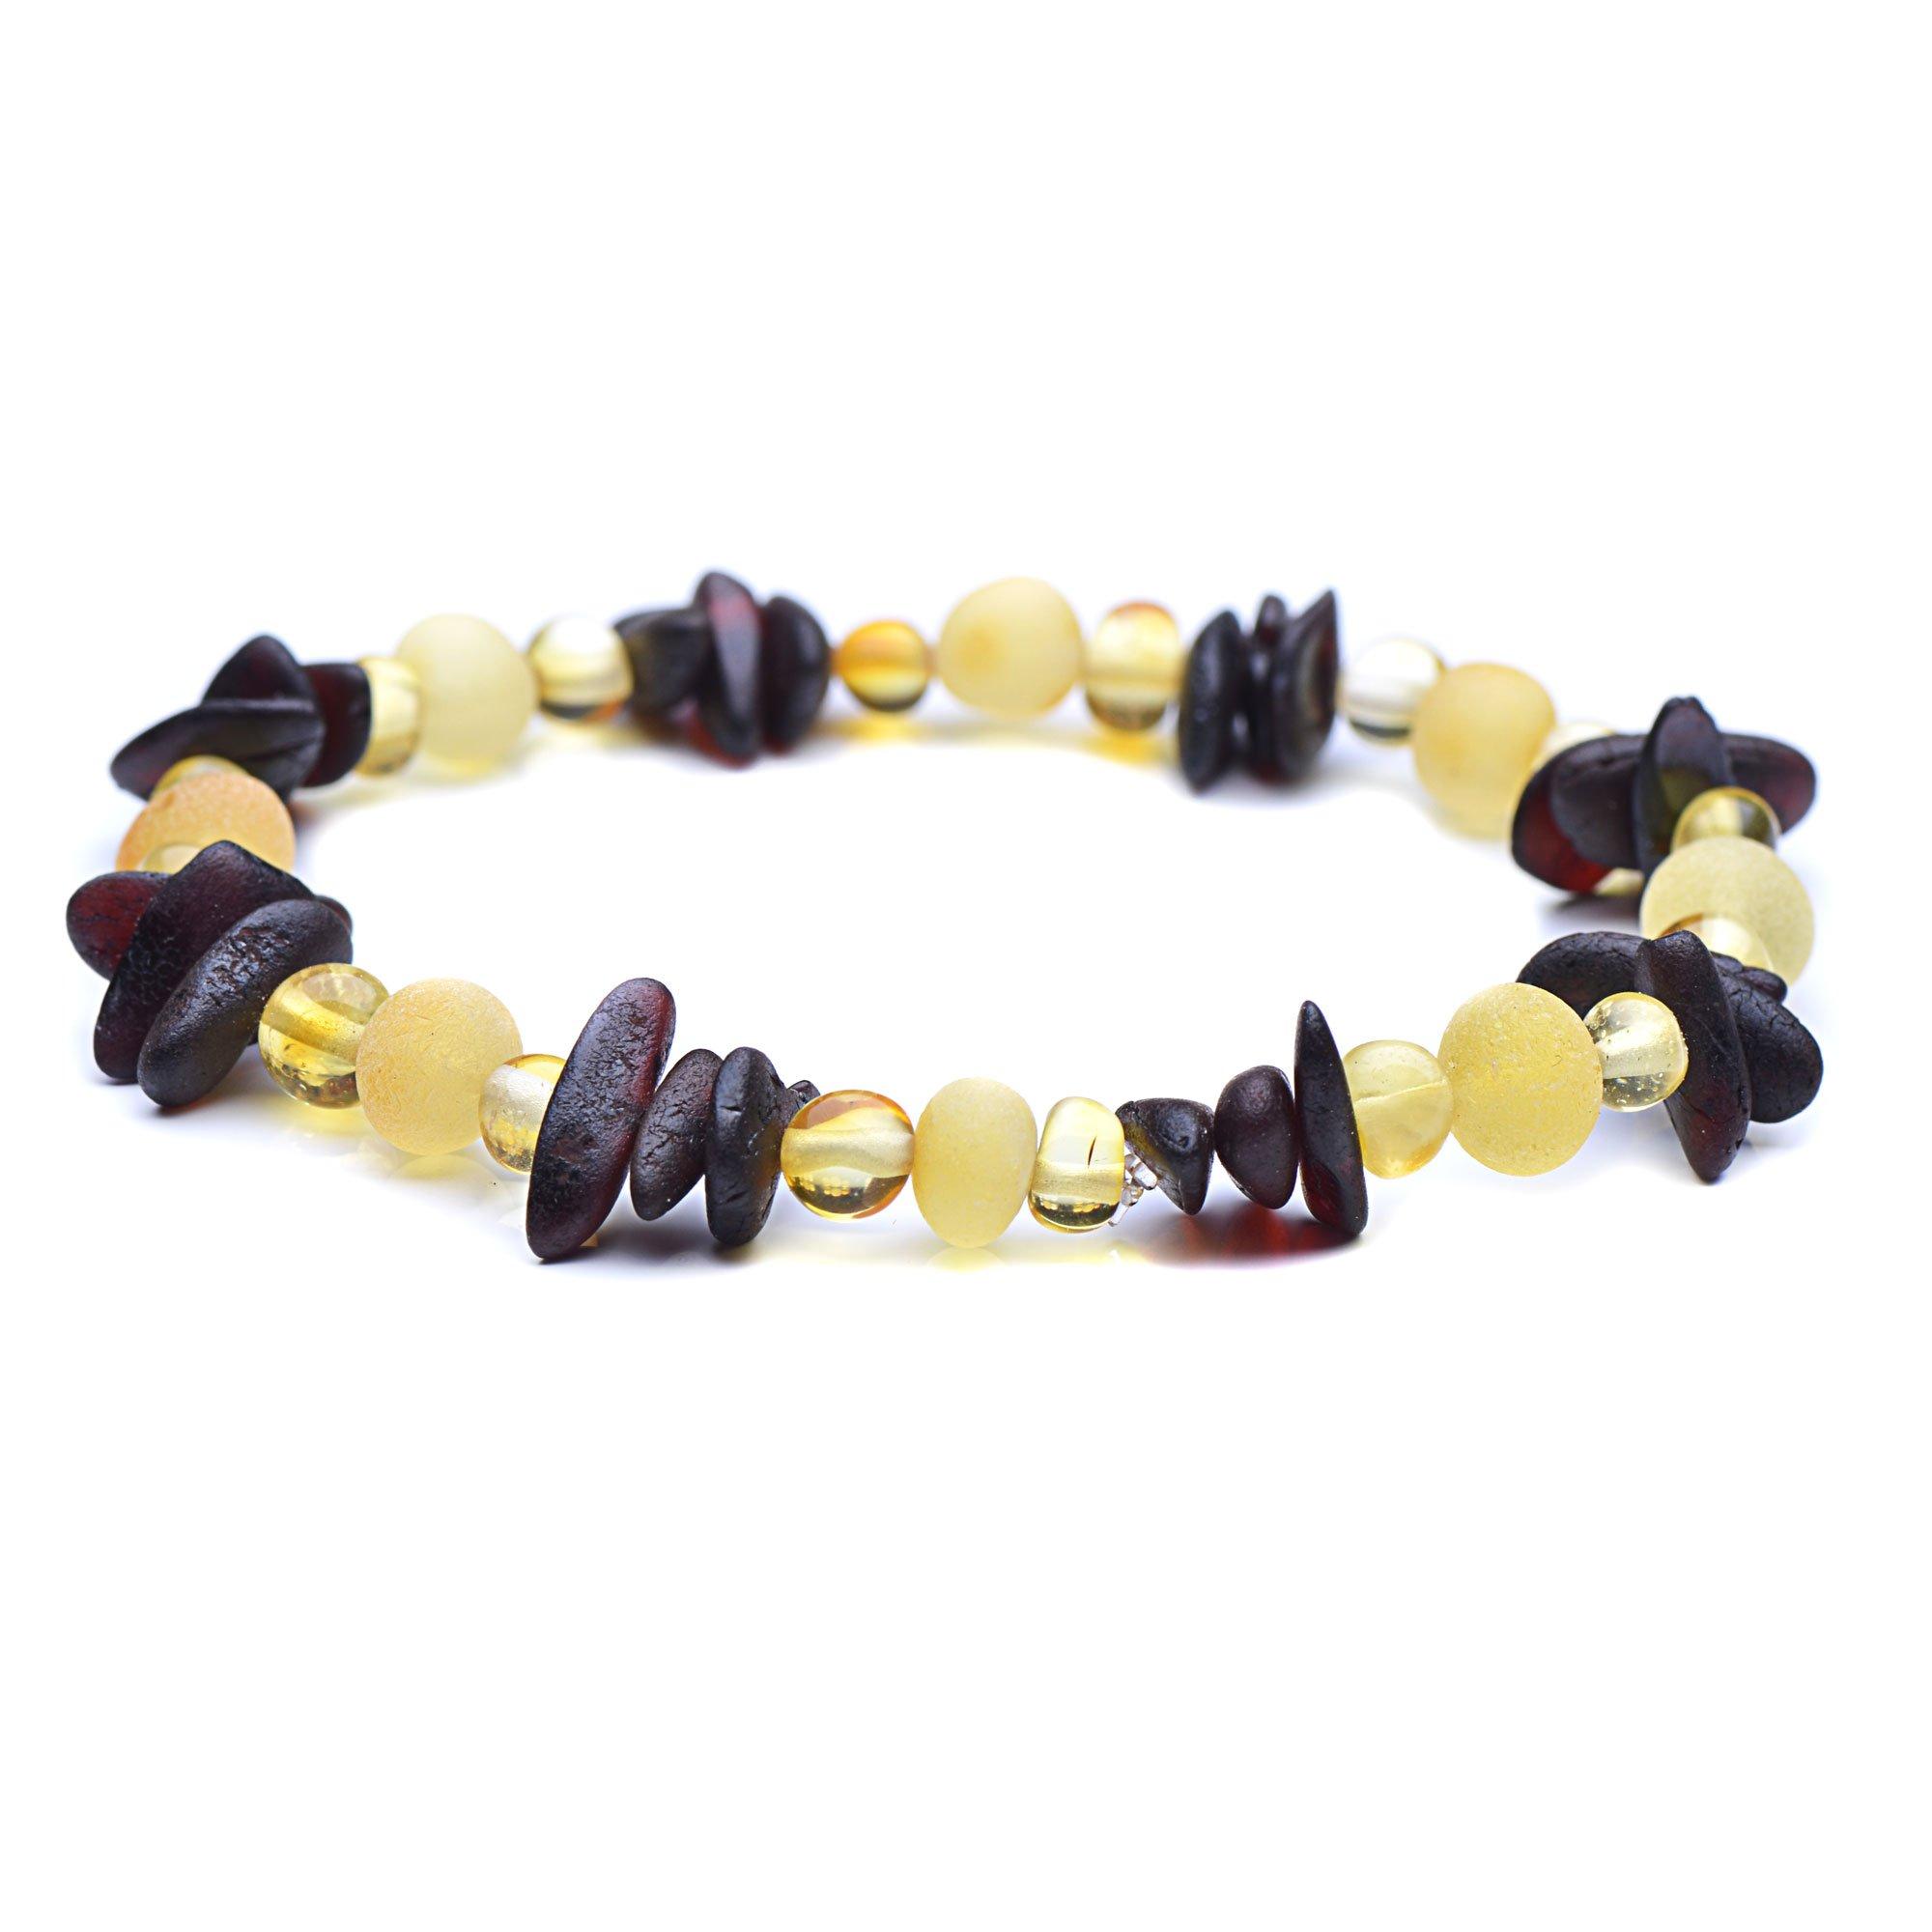 Authentic Baltic Amber Bracelet - 3 Sizes to Choose - Unique Adult Amber Bracelet (7inches)